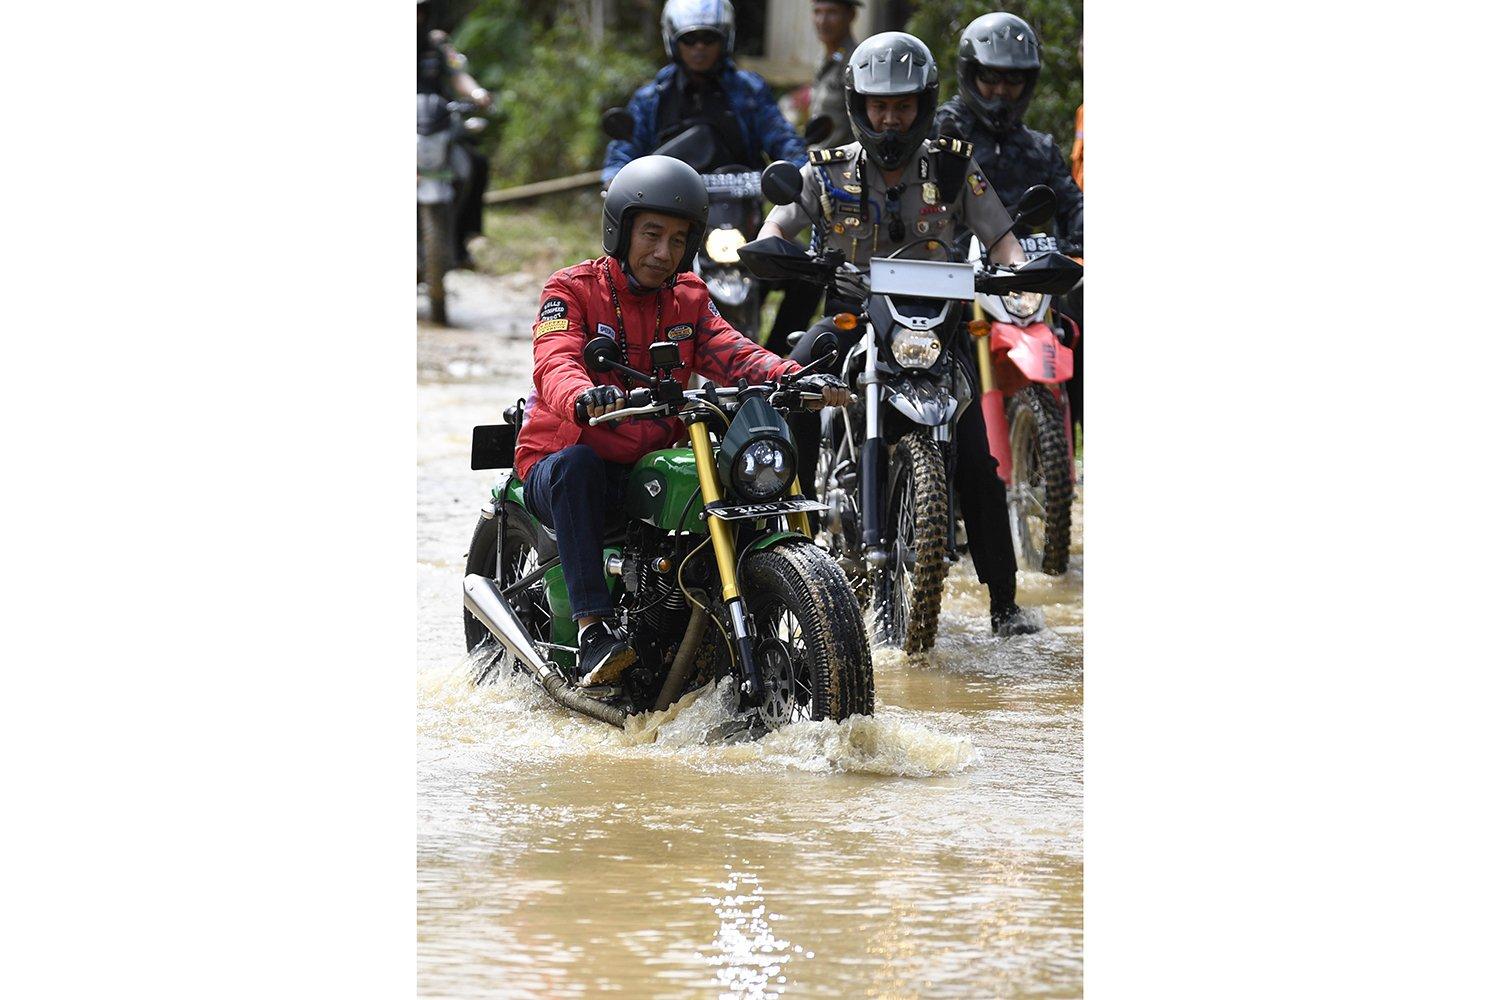 Jokowi terlihat mengenakan helm berwarna hitam lengkap dan sarung tangan berwarna hitam. Jalan tanah hingga genangan air di lalui Jokowi dan rombongannya.